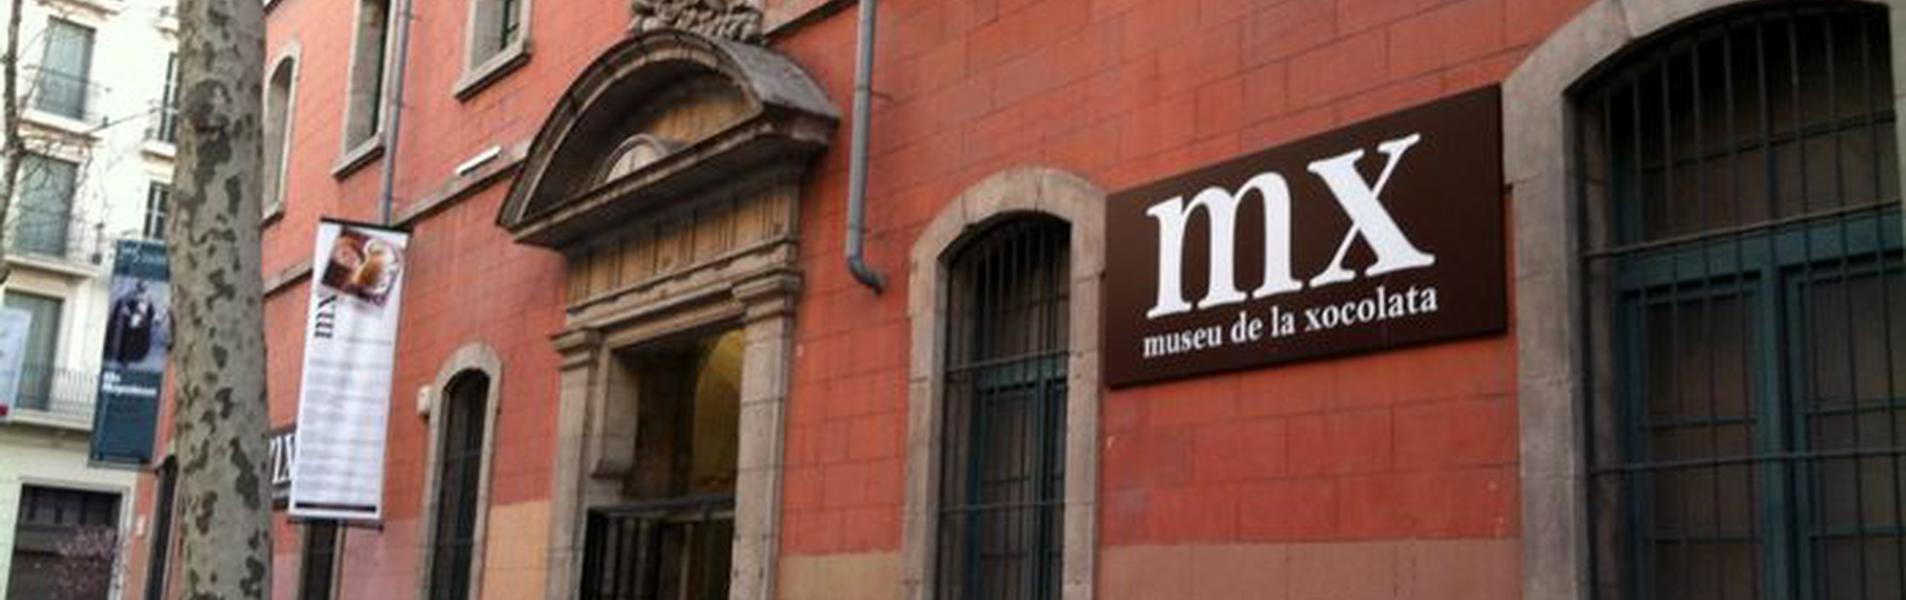 Museo de la xocolata